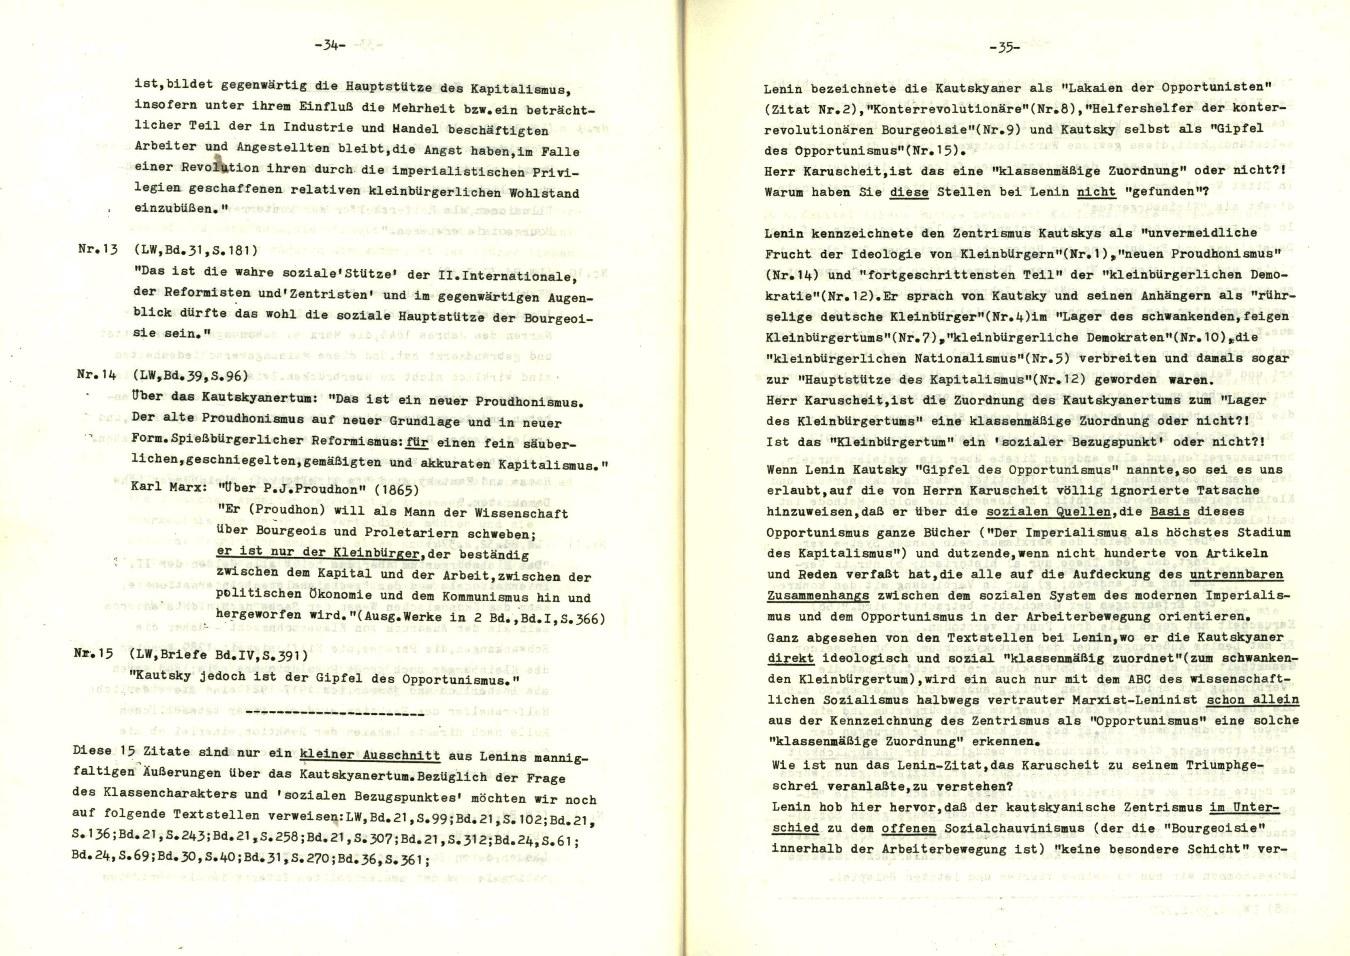 Muenchen_Kampf_dem_Revisionismus_1979_09_18